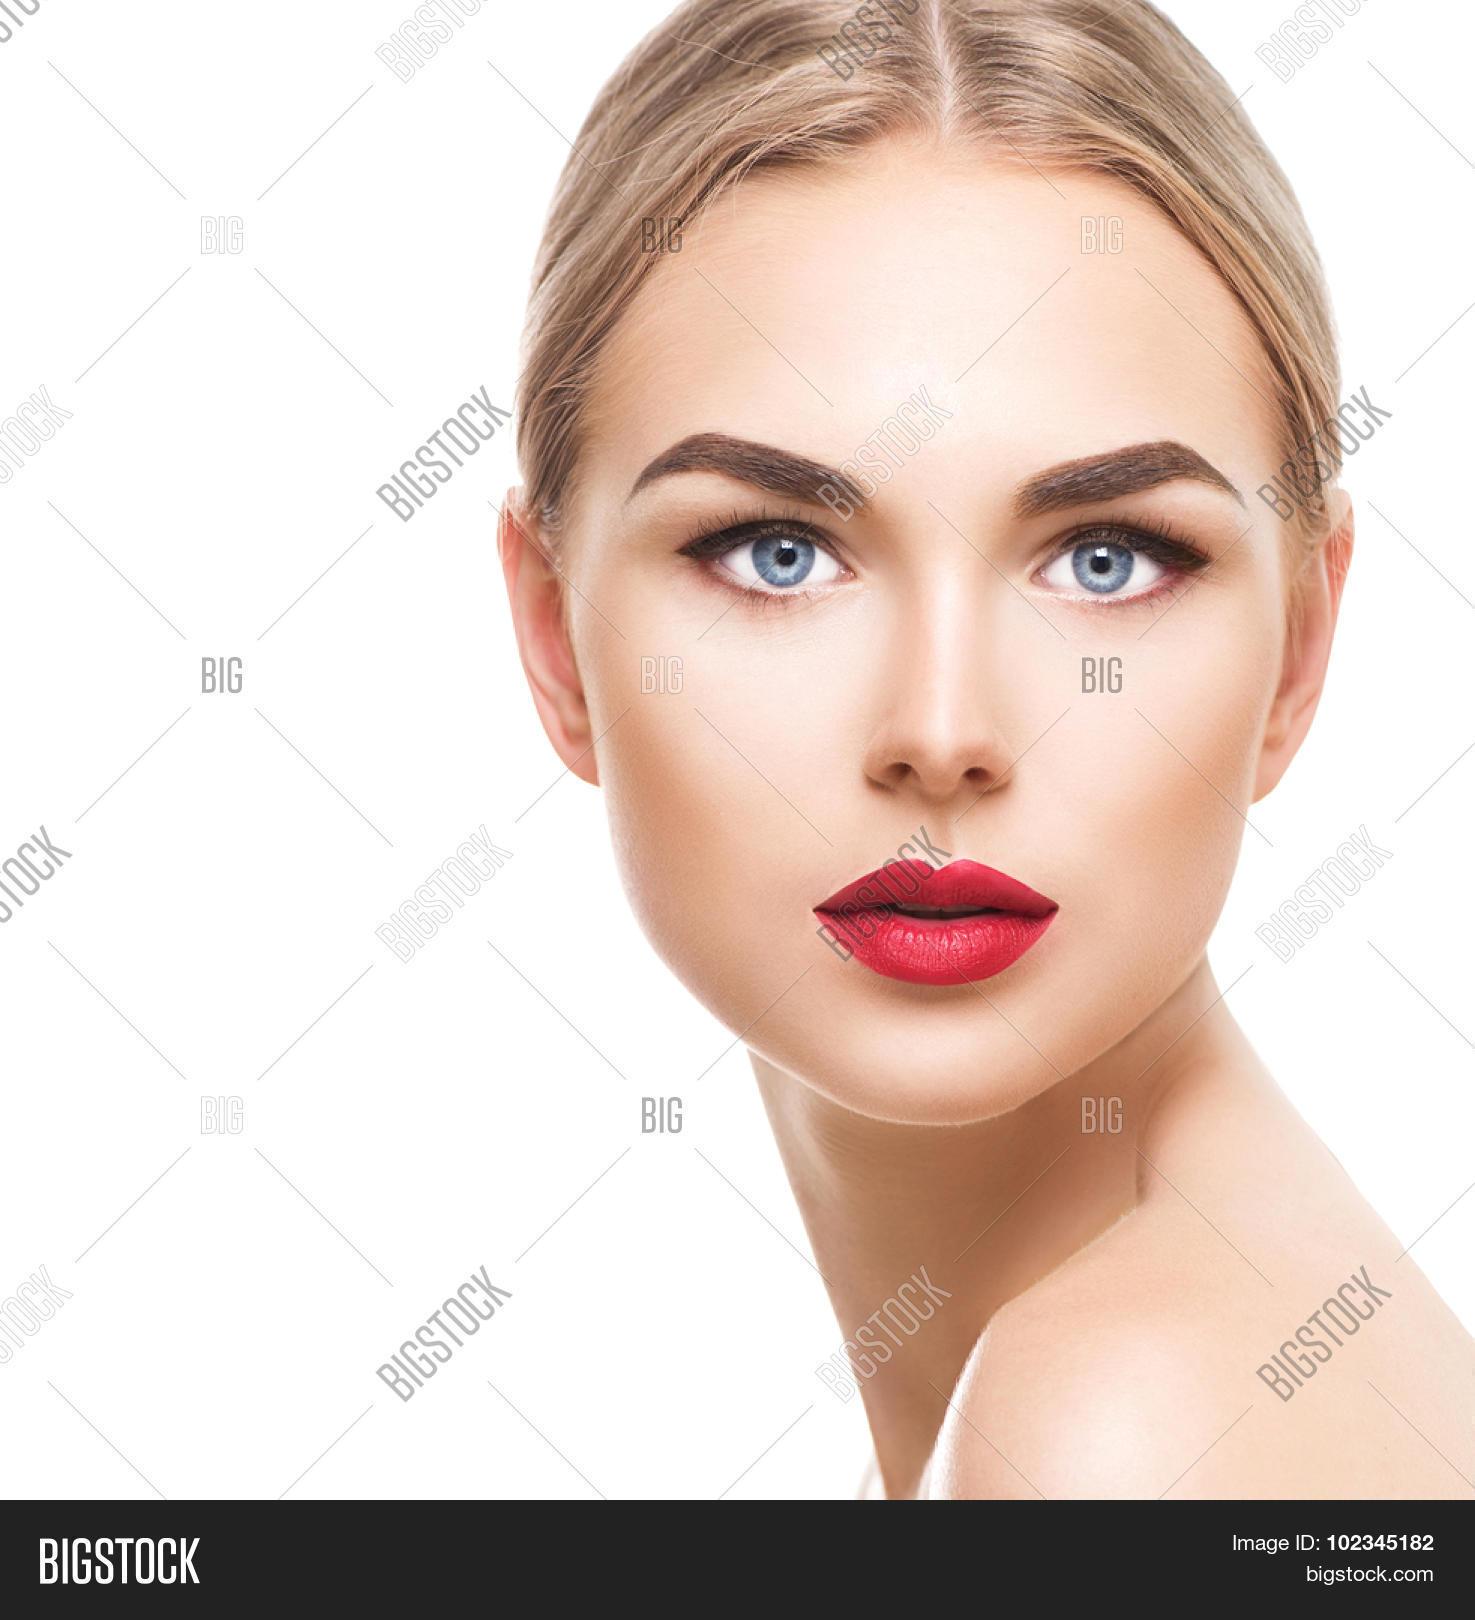 Beautiful Blonde Model Woman Face Image & Photo | Bigstock